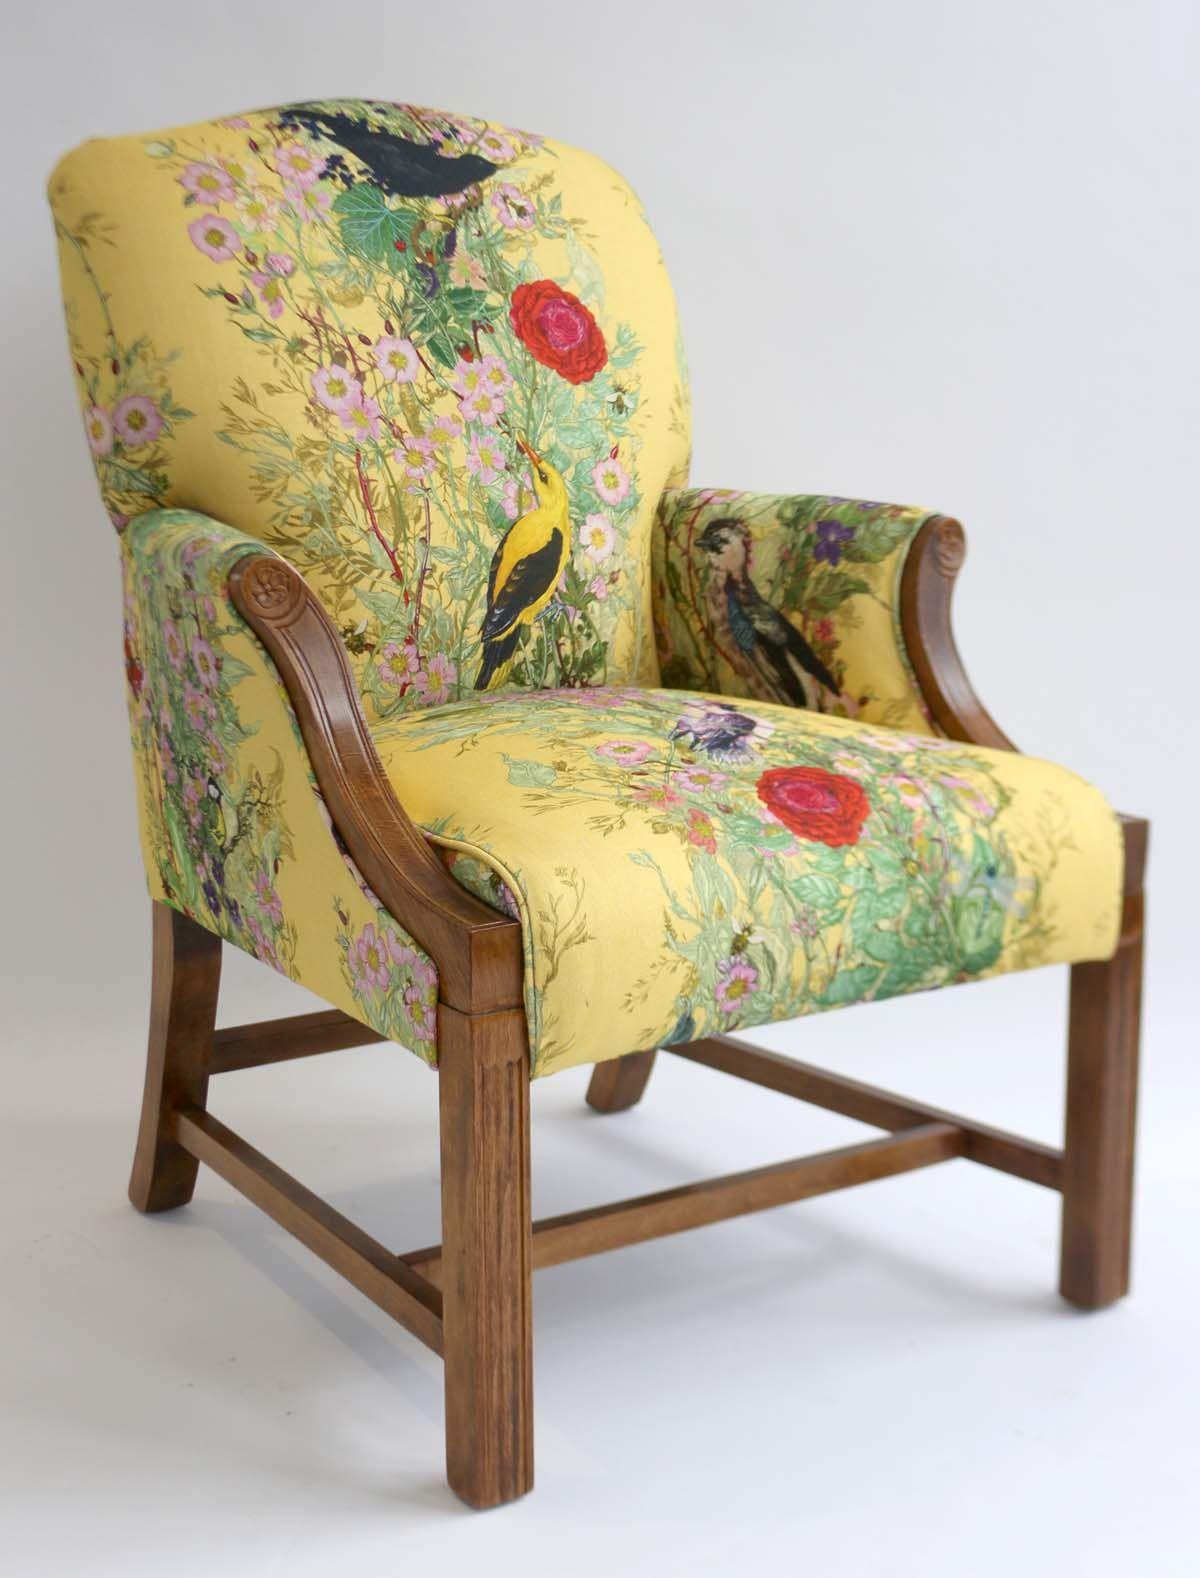 Furniture timorous beasties furniture in pinterest